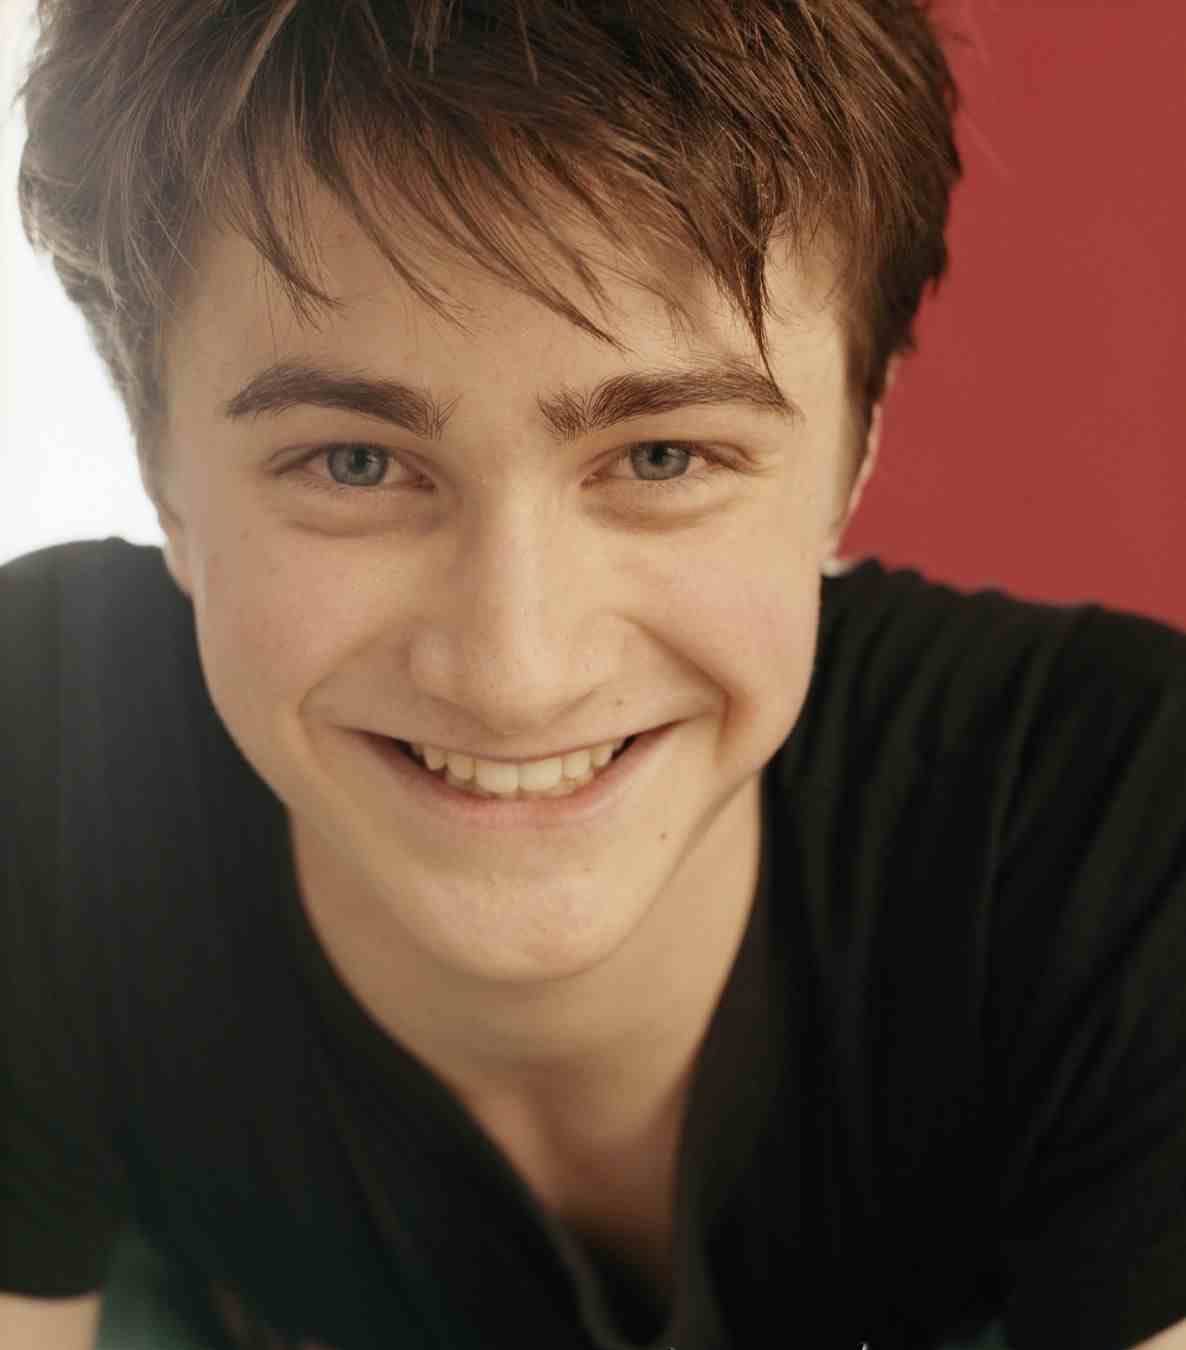 Infinity: Daniel Radcliffe Biography Daniel Radcliffe